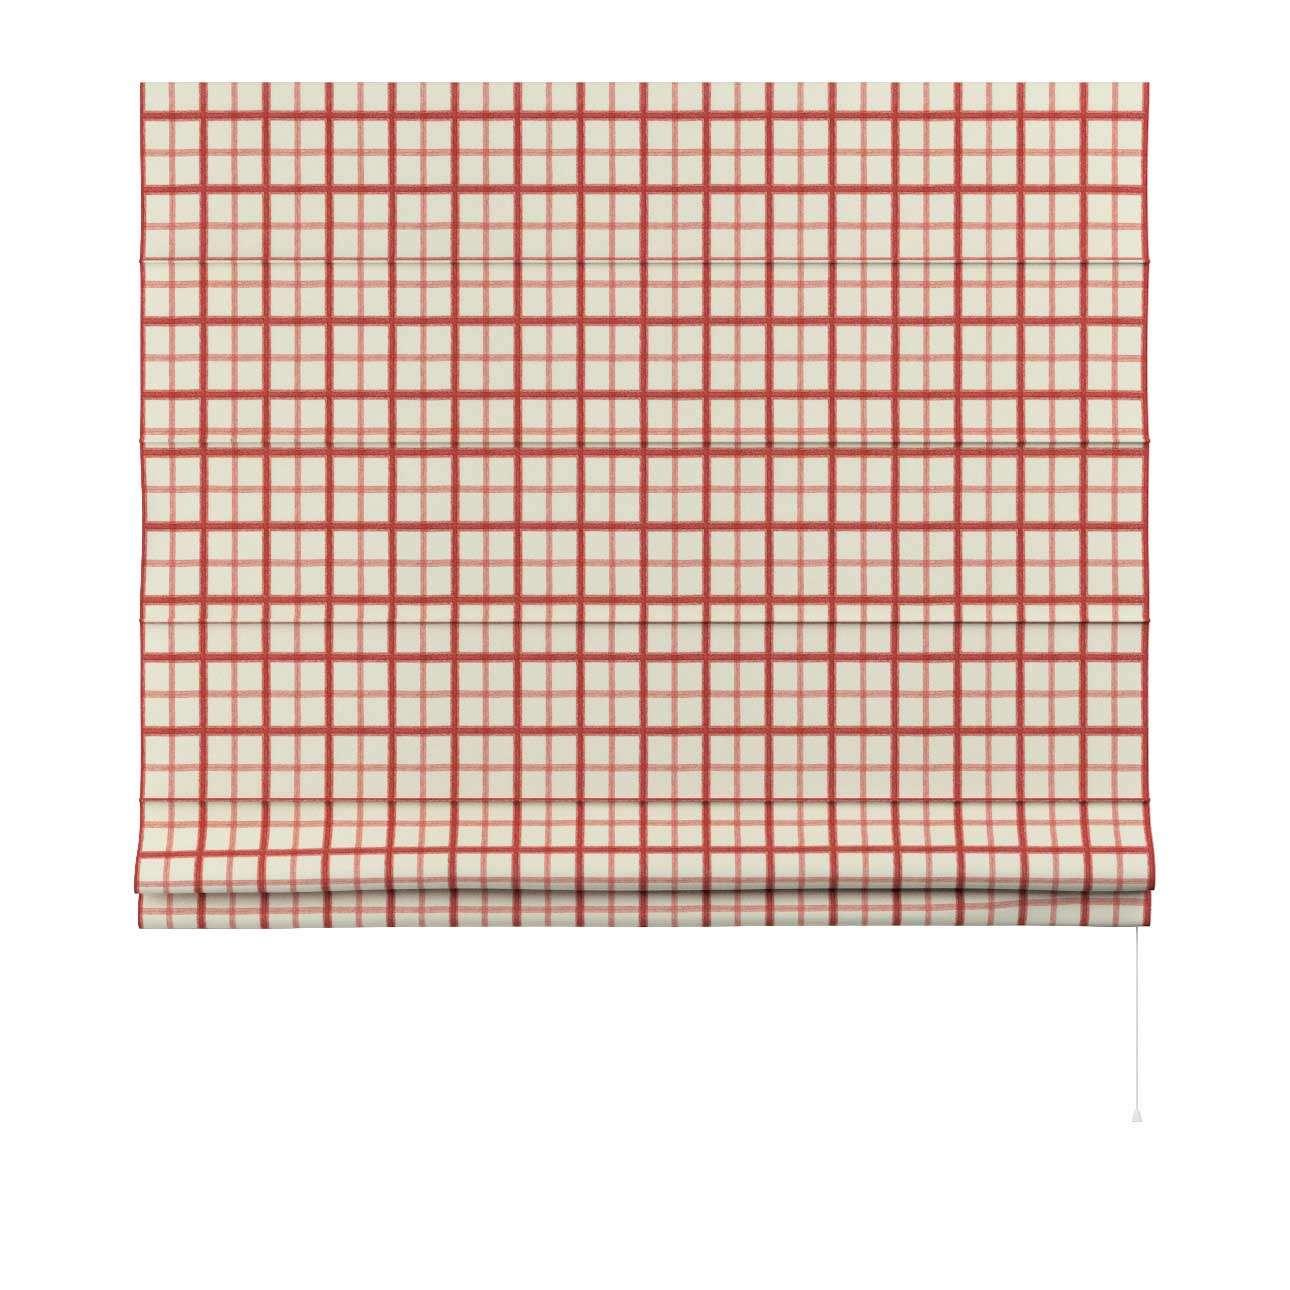 Romanetės Capri 80 x 170 cm (plotis x ilgis) kolekcijoje Avinon, audinys: 131-15